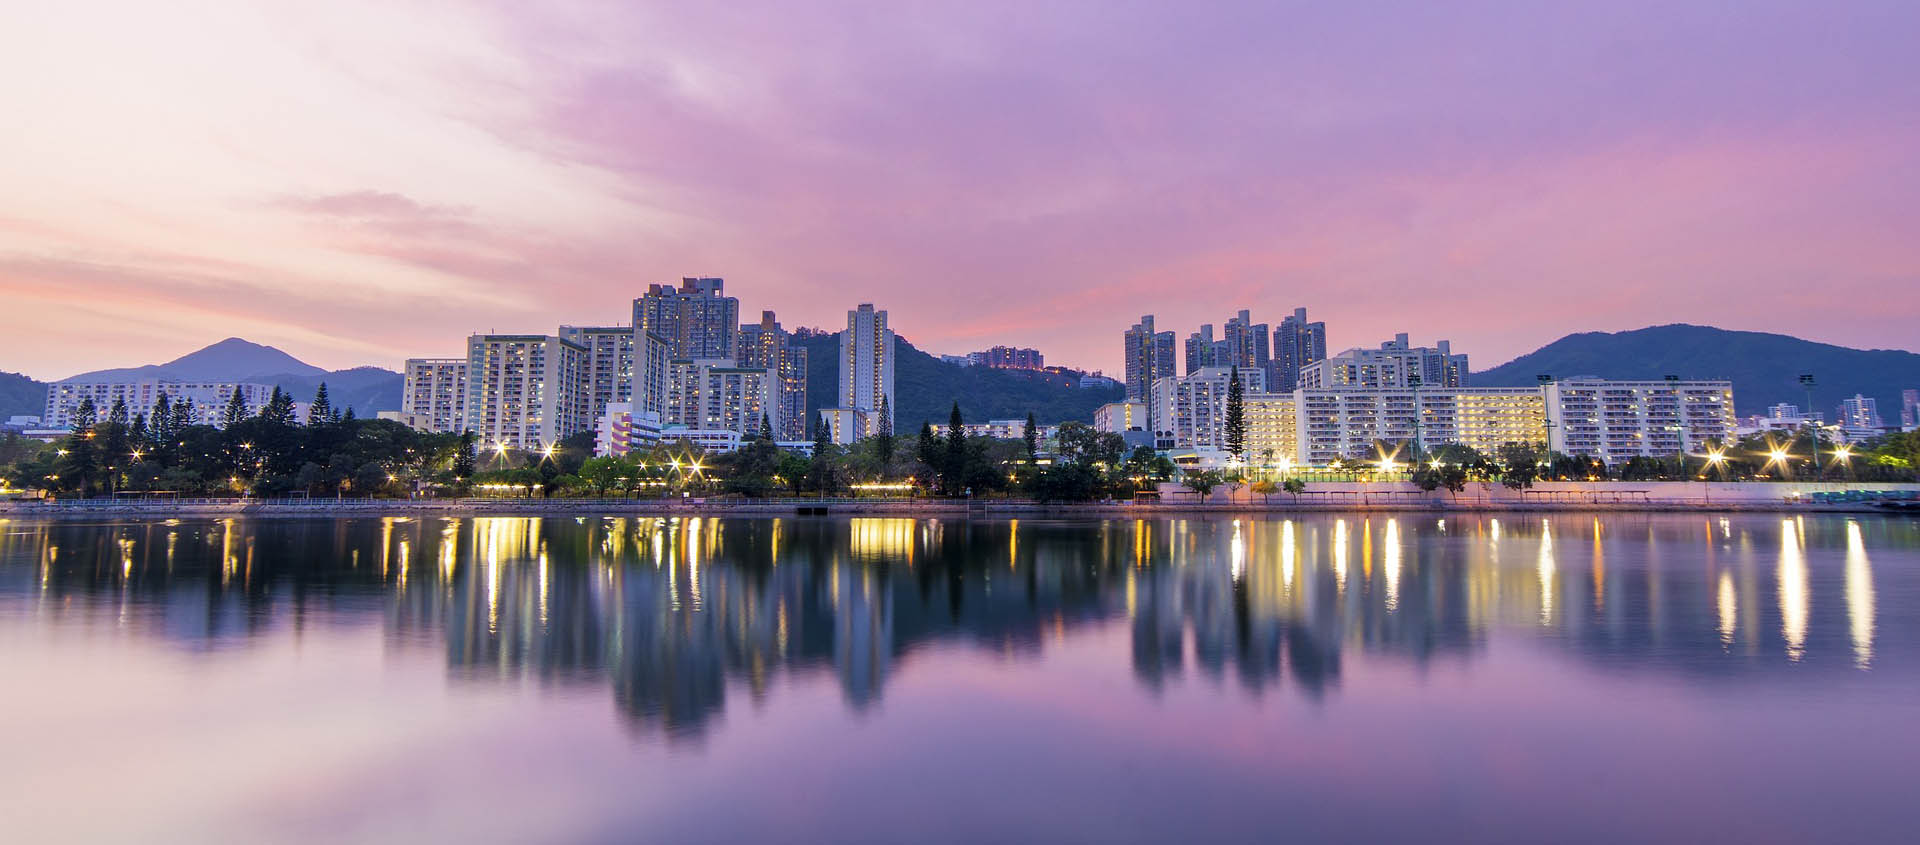 Peking & Hong Kong in einer Reise 8-tägig